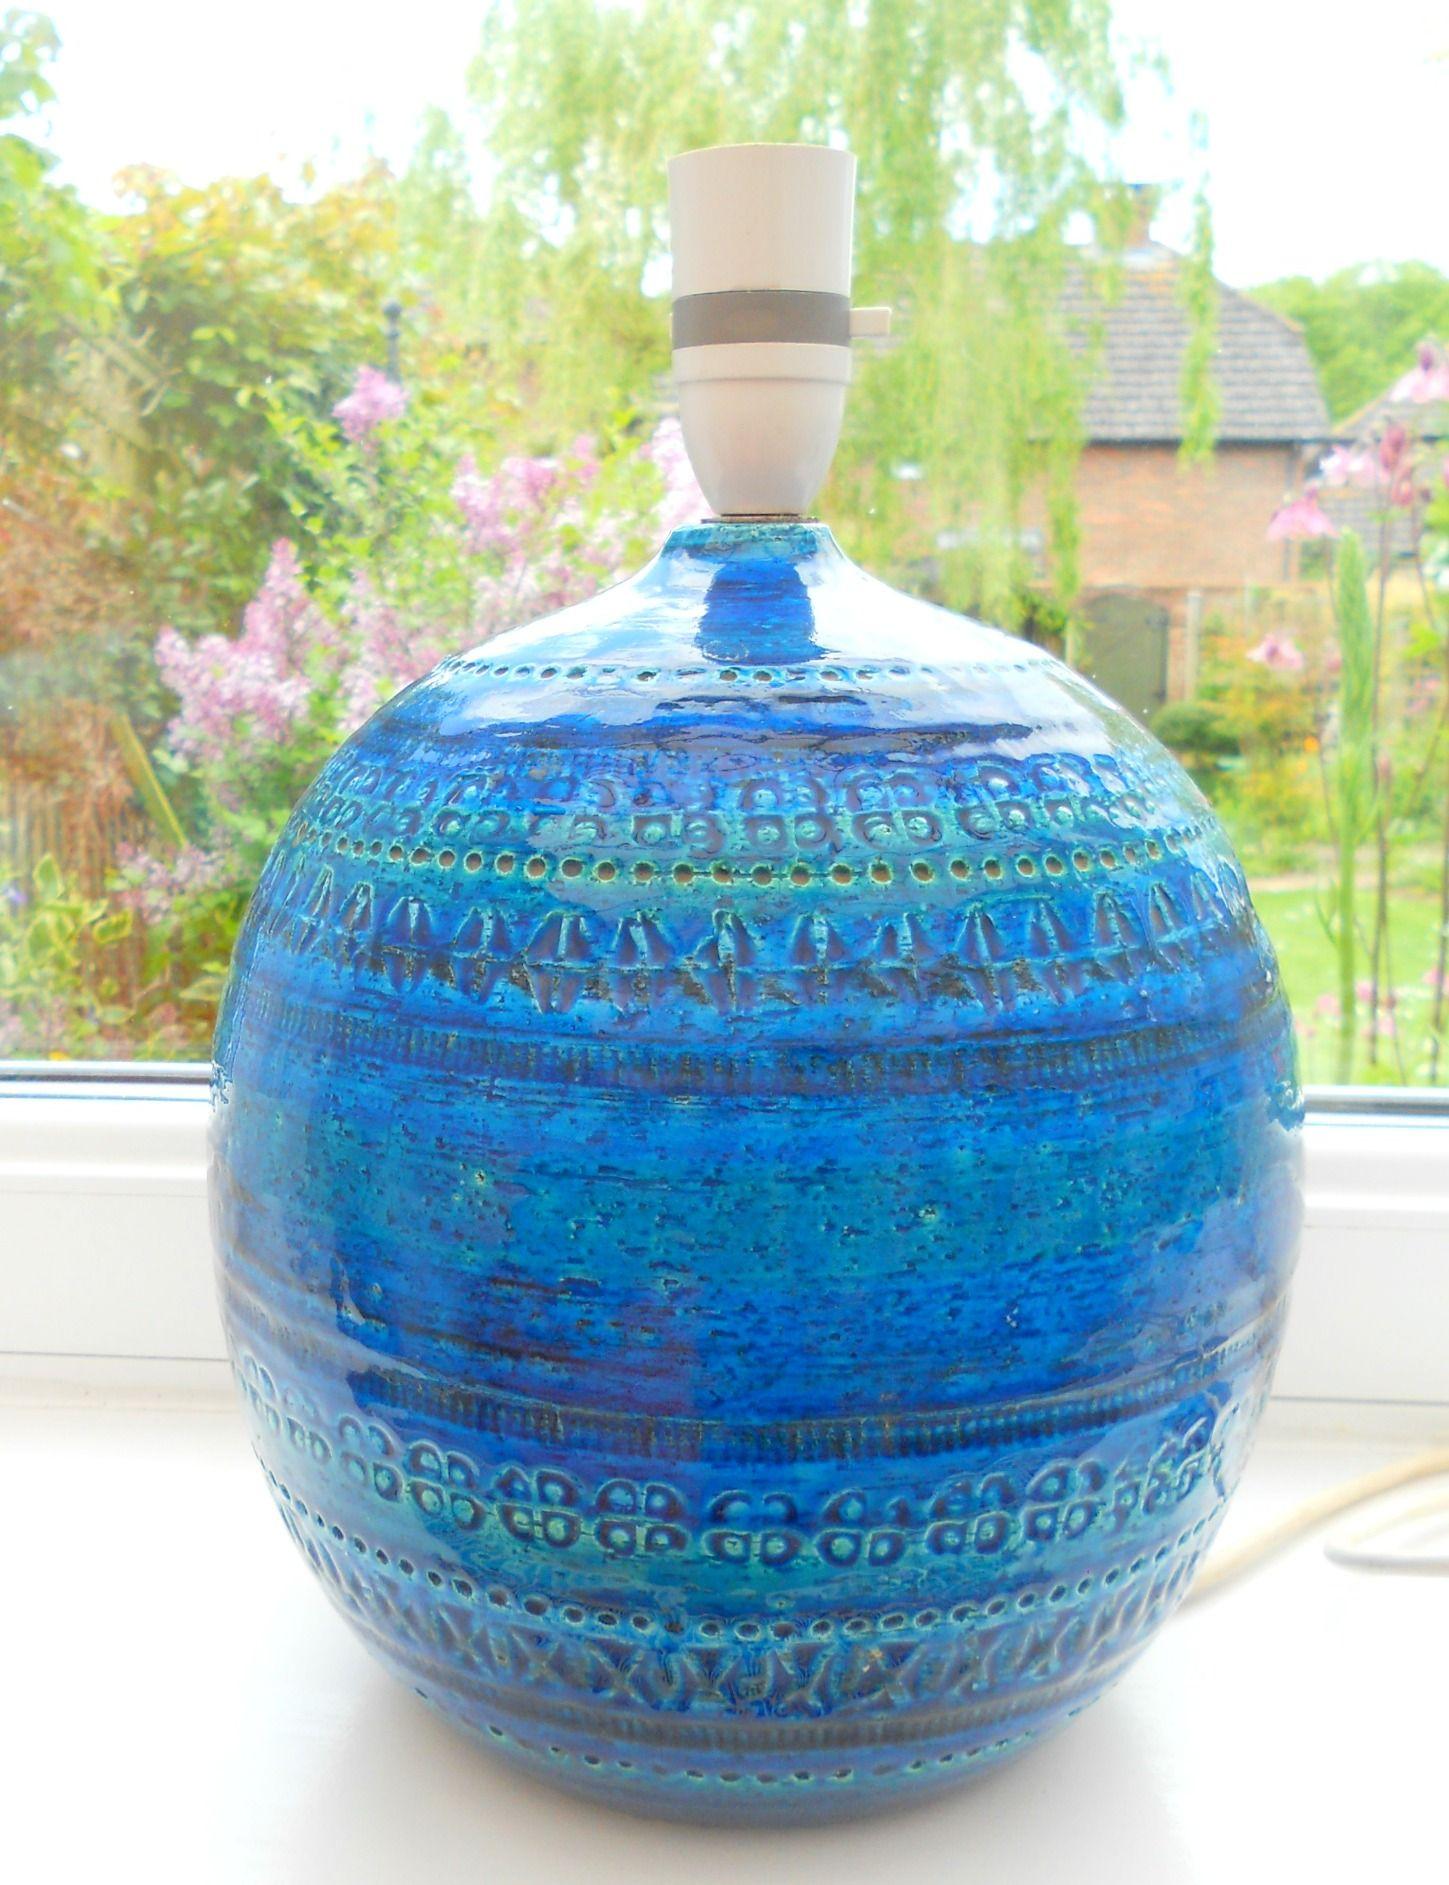 Vintage 1960s Bitossi Aldo Londi Large Lamp Base Sold On My Ebay Site Lubbydot1 Large Floor Lamp Vintage Pottery Pottery